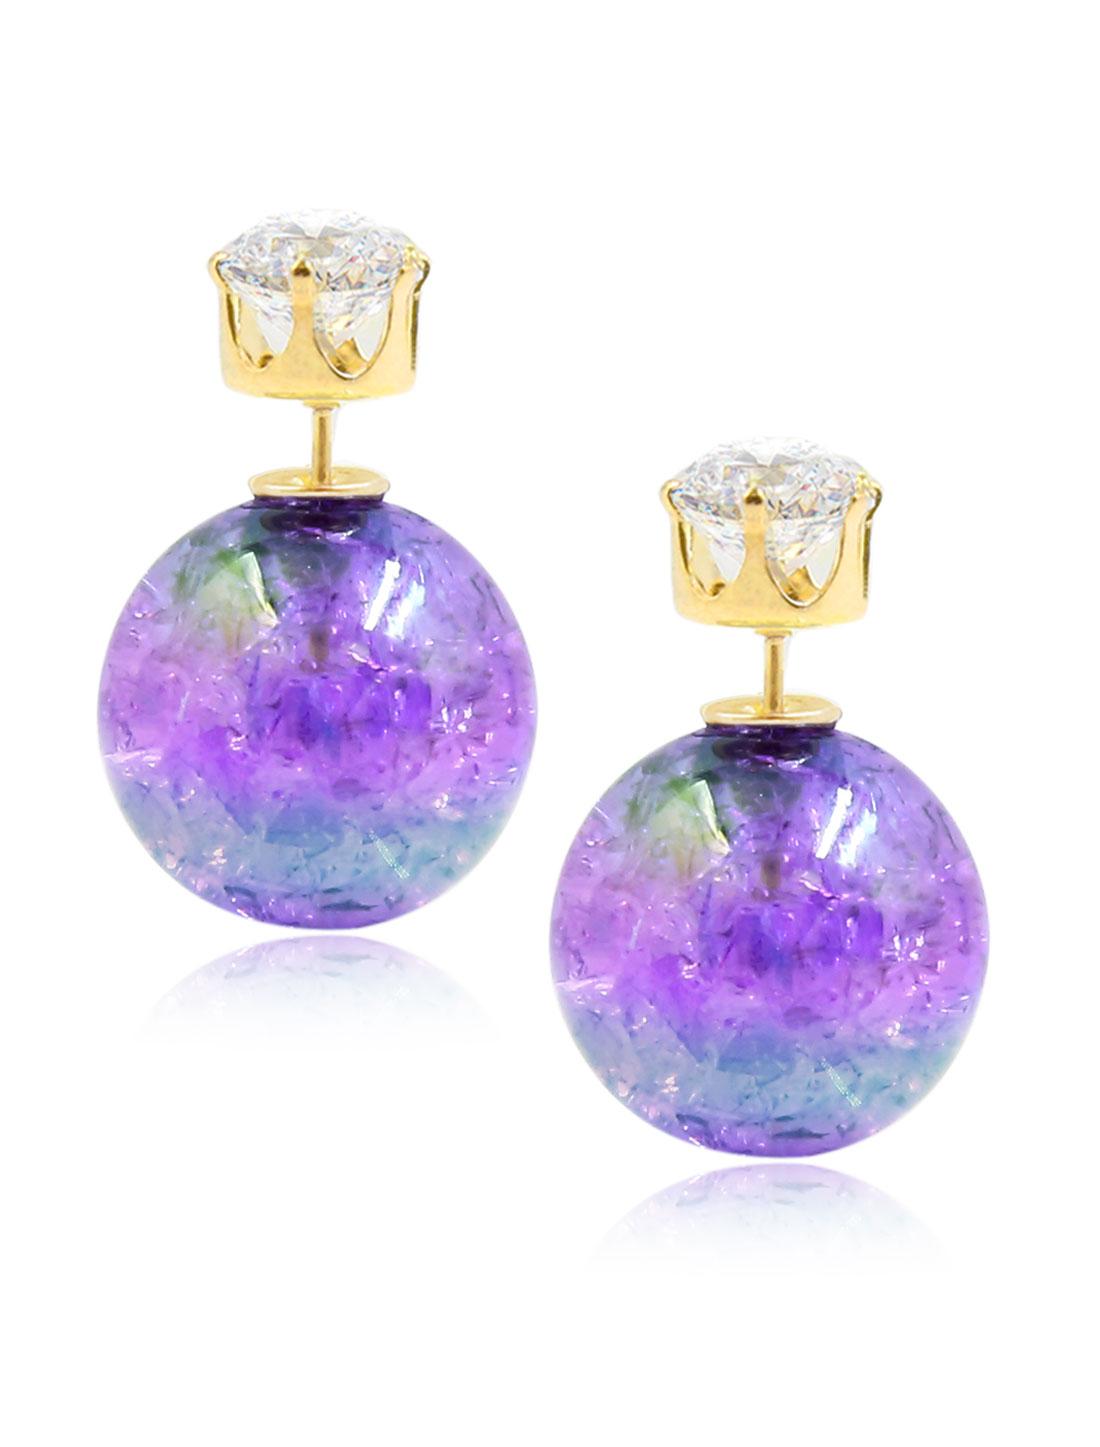 Fashion Women Elegant Double Sides Zircon Faux Crystal Ball Illusion-colour Earrings Ear Stud 1 Pair Purple